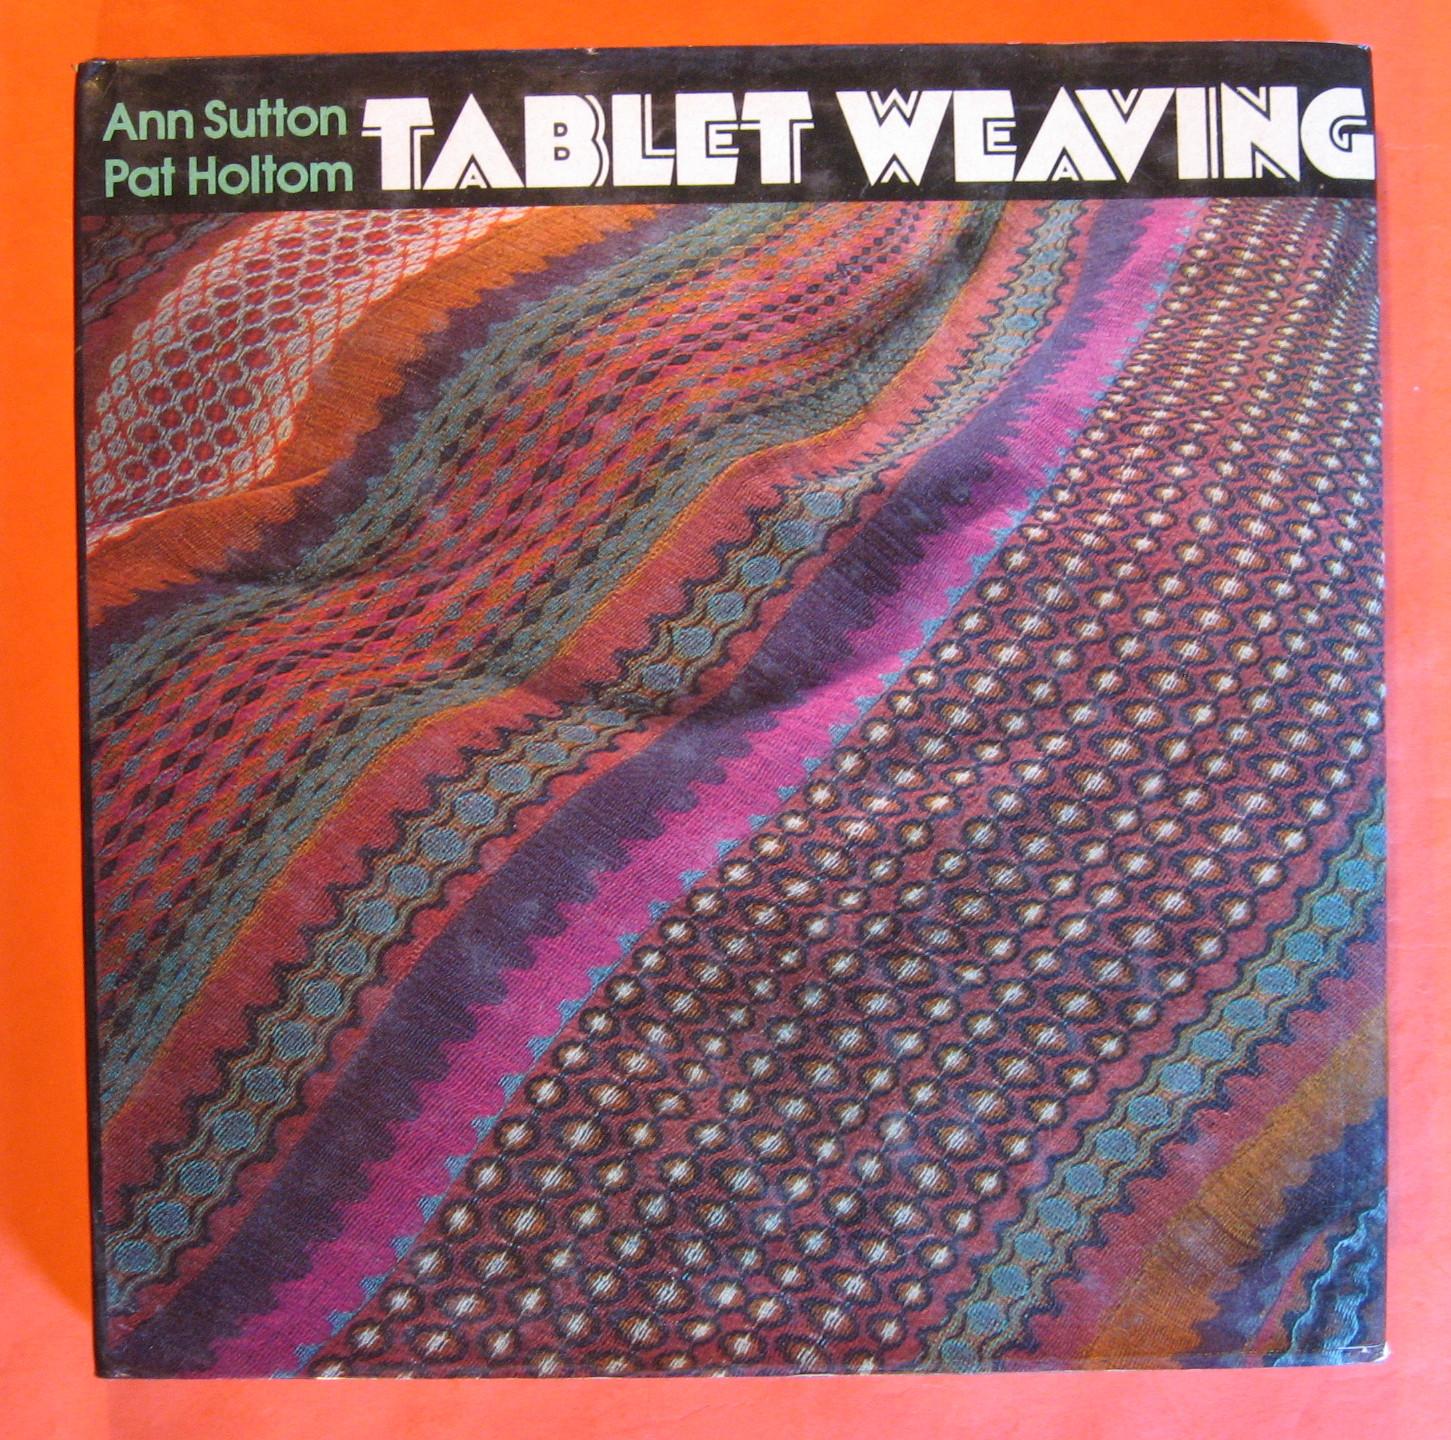 Tablet Weaving, Ann Sutton; Pat Holtom